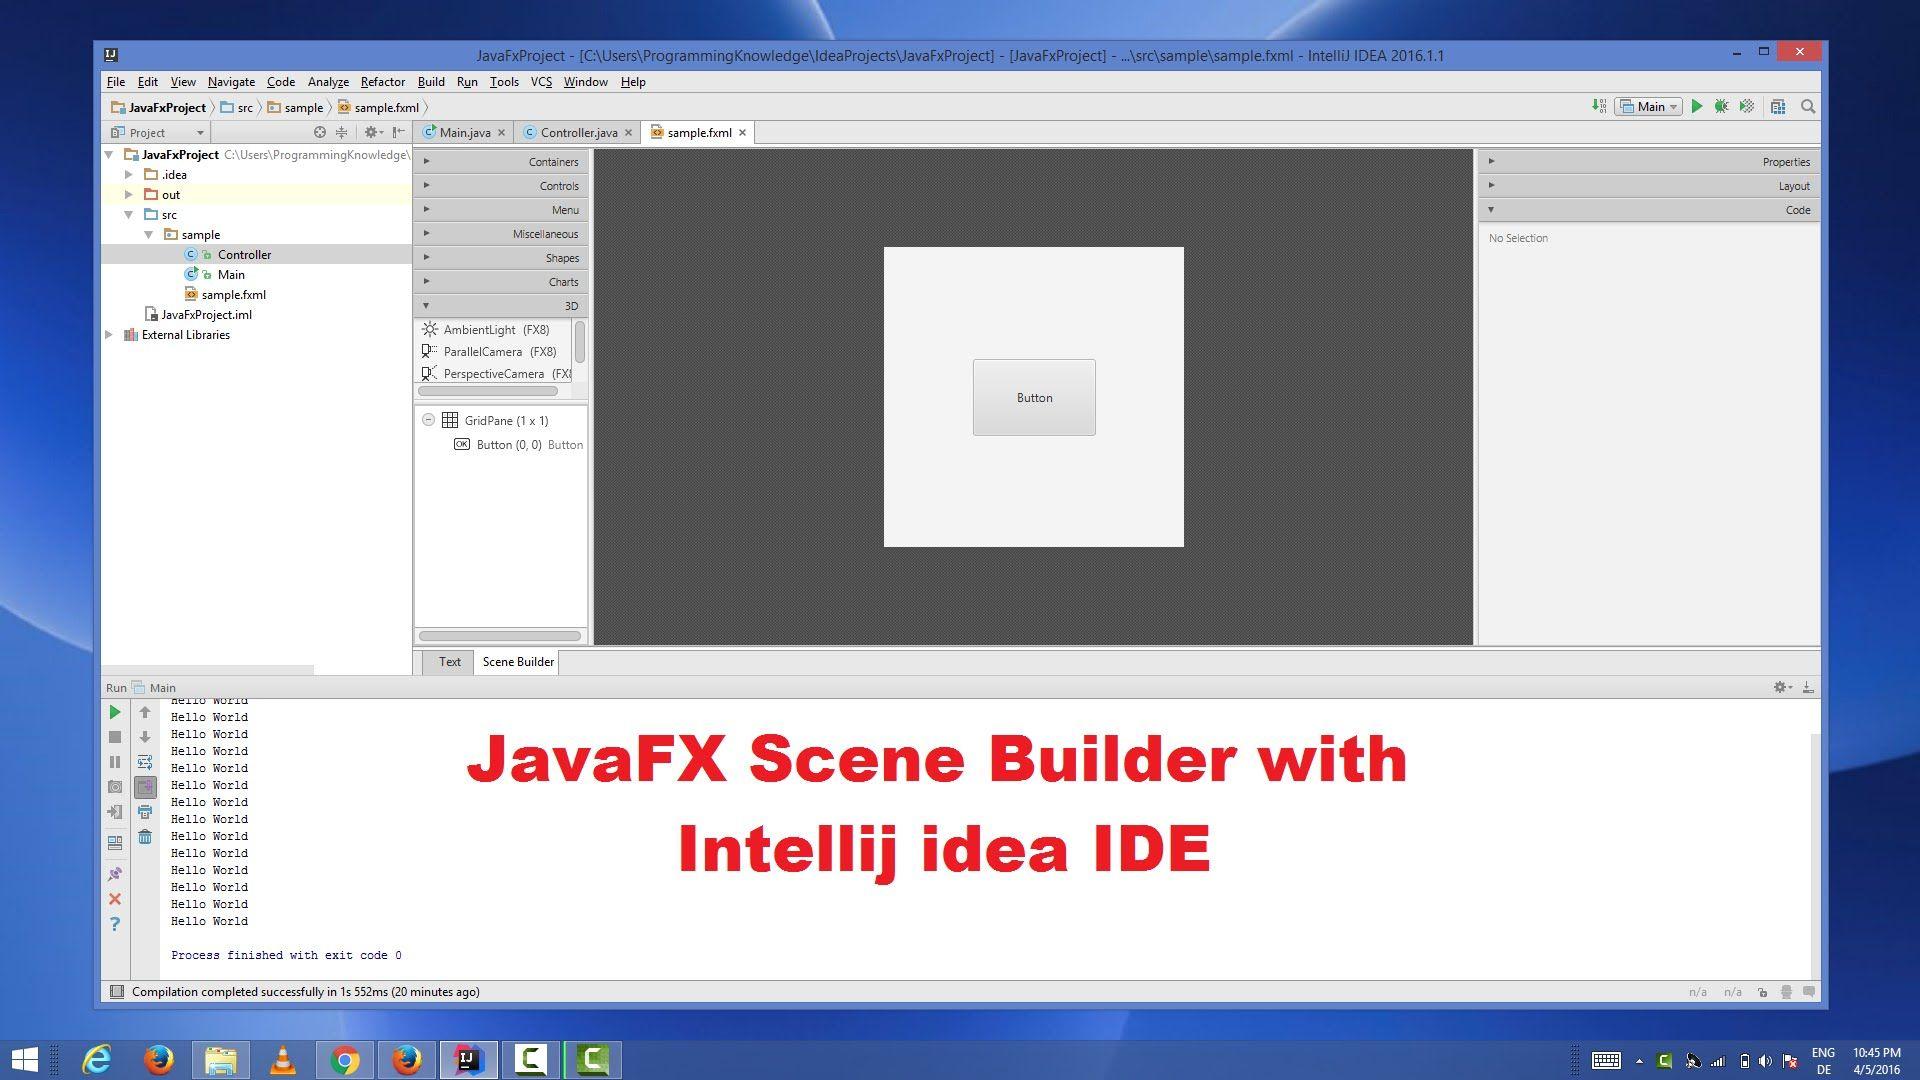 How to Create a JavaFX Project in IntelliJ IDEA Using Scene